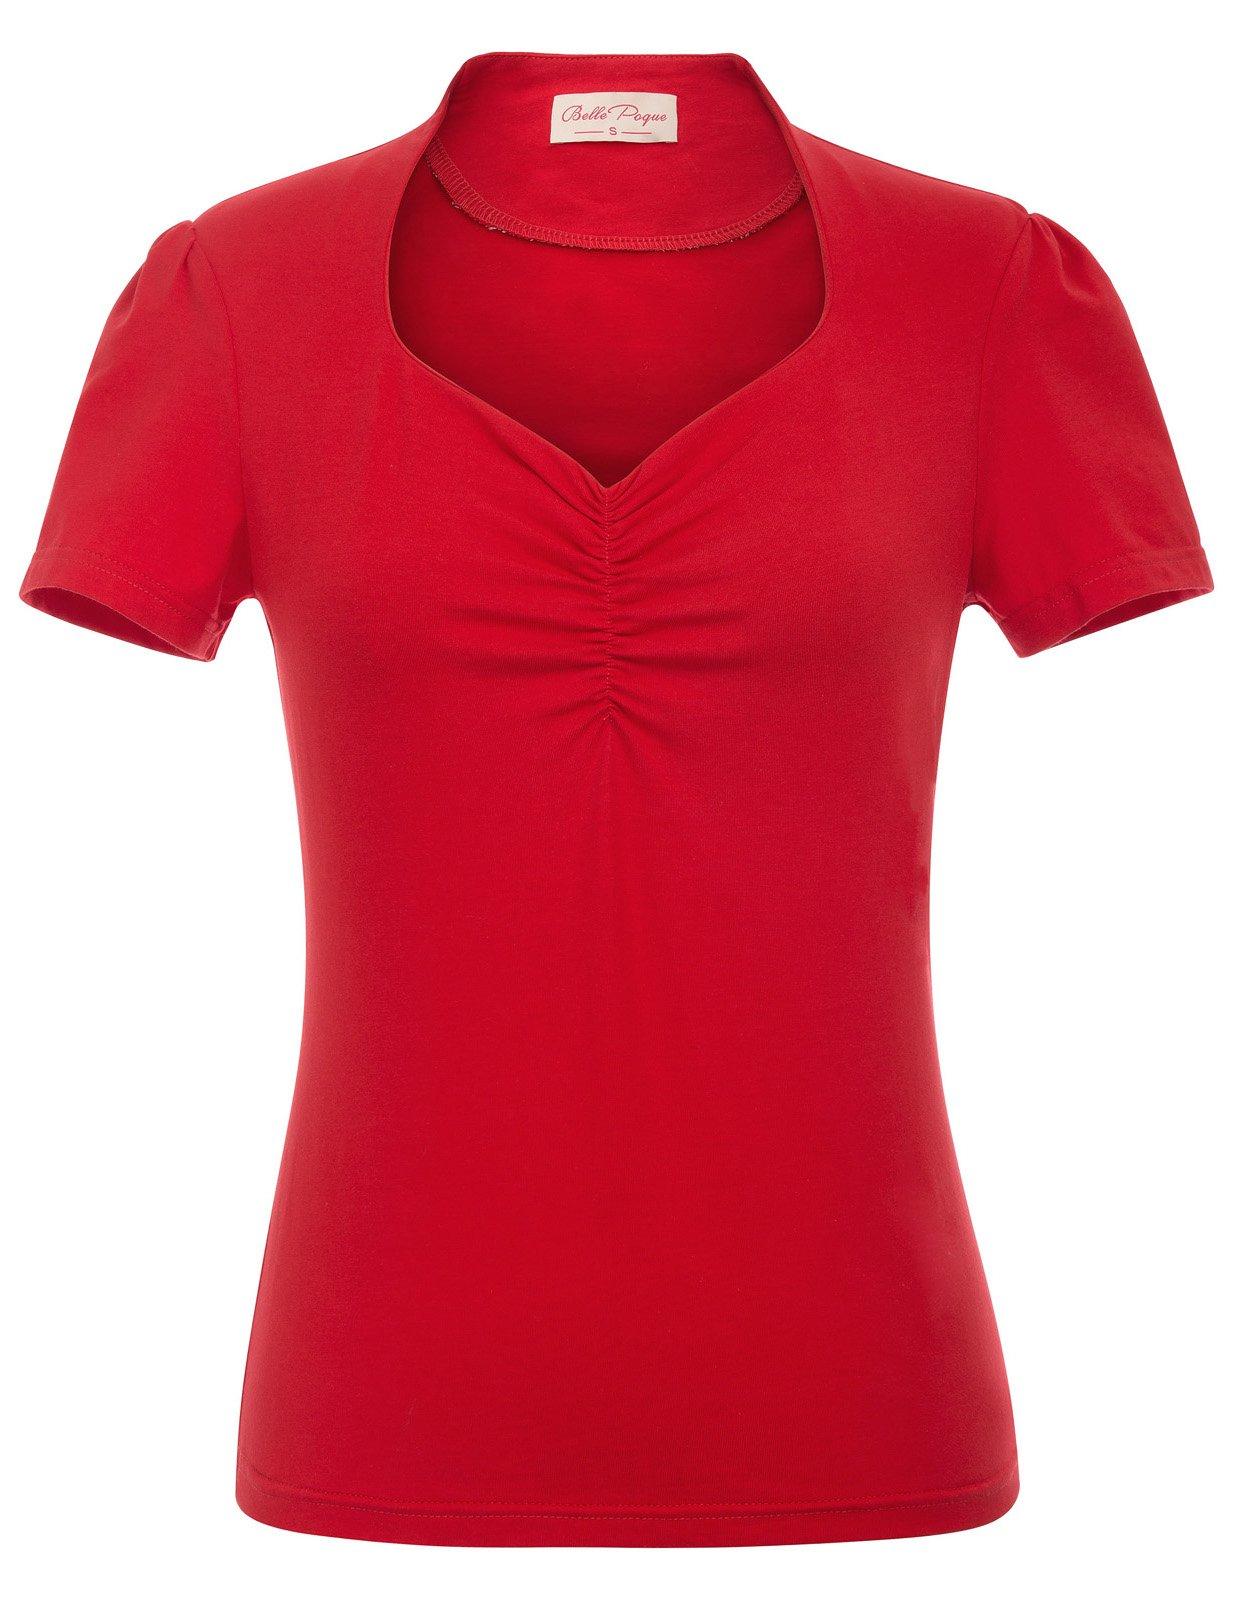 Belle Poque Women's Retro Vintage Short Sleeve V-Neck Causal Blouse Tops Red Size S BP563-2